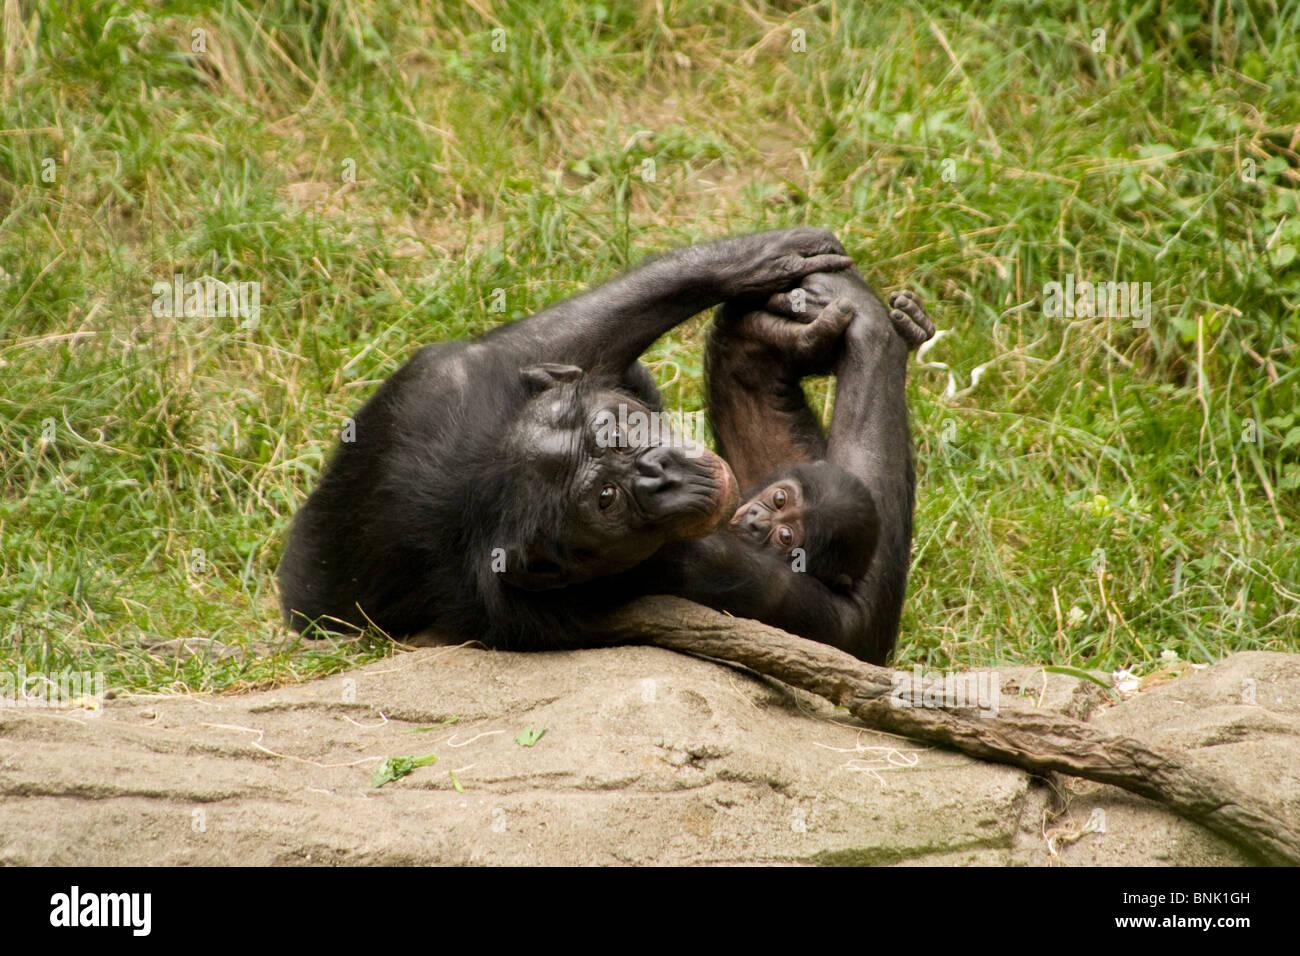 Mother with Baby. Bonobo or Pygmy Chimp. Cincinnati Zoo, Cincinnati, Ohio USA. - Stock Image